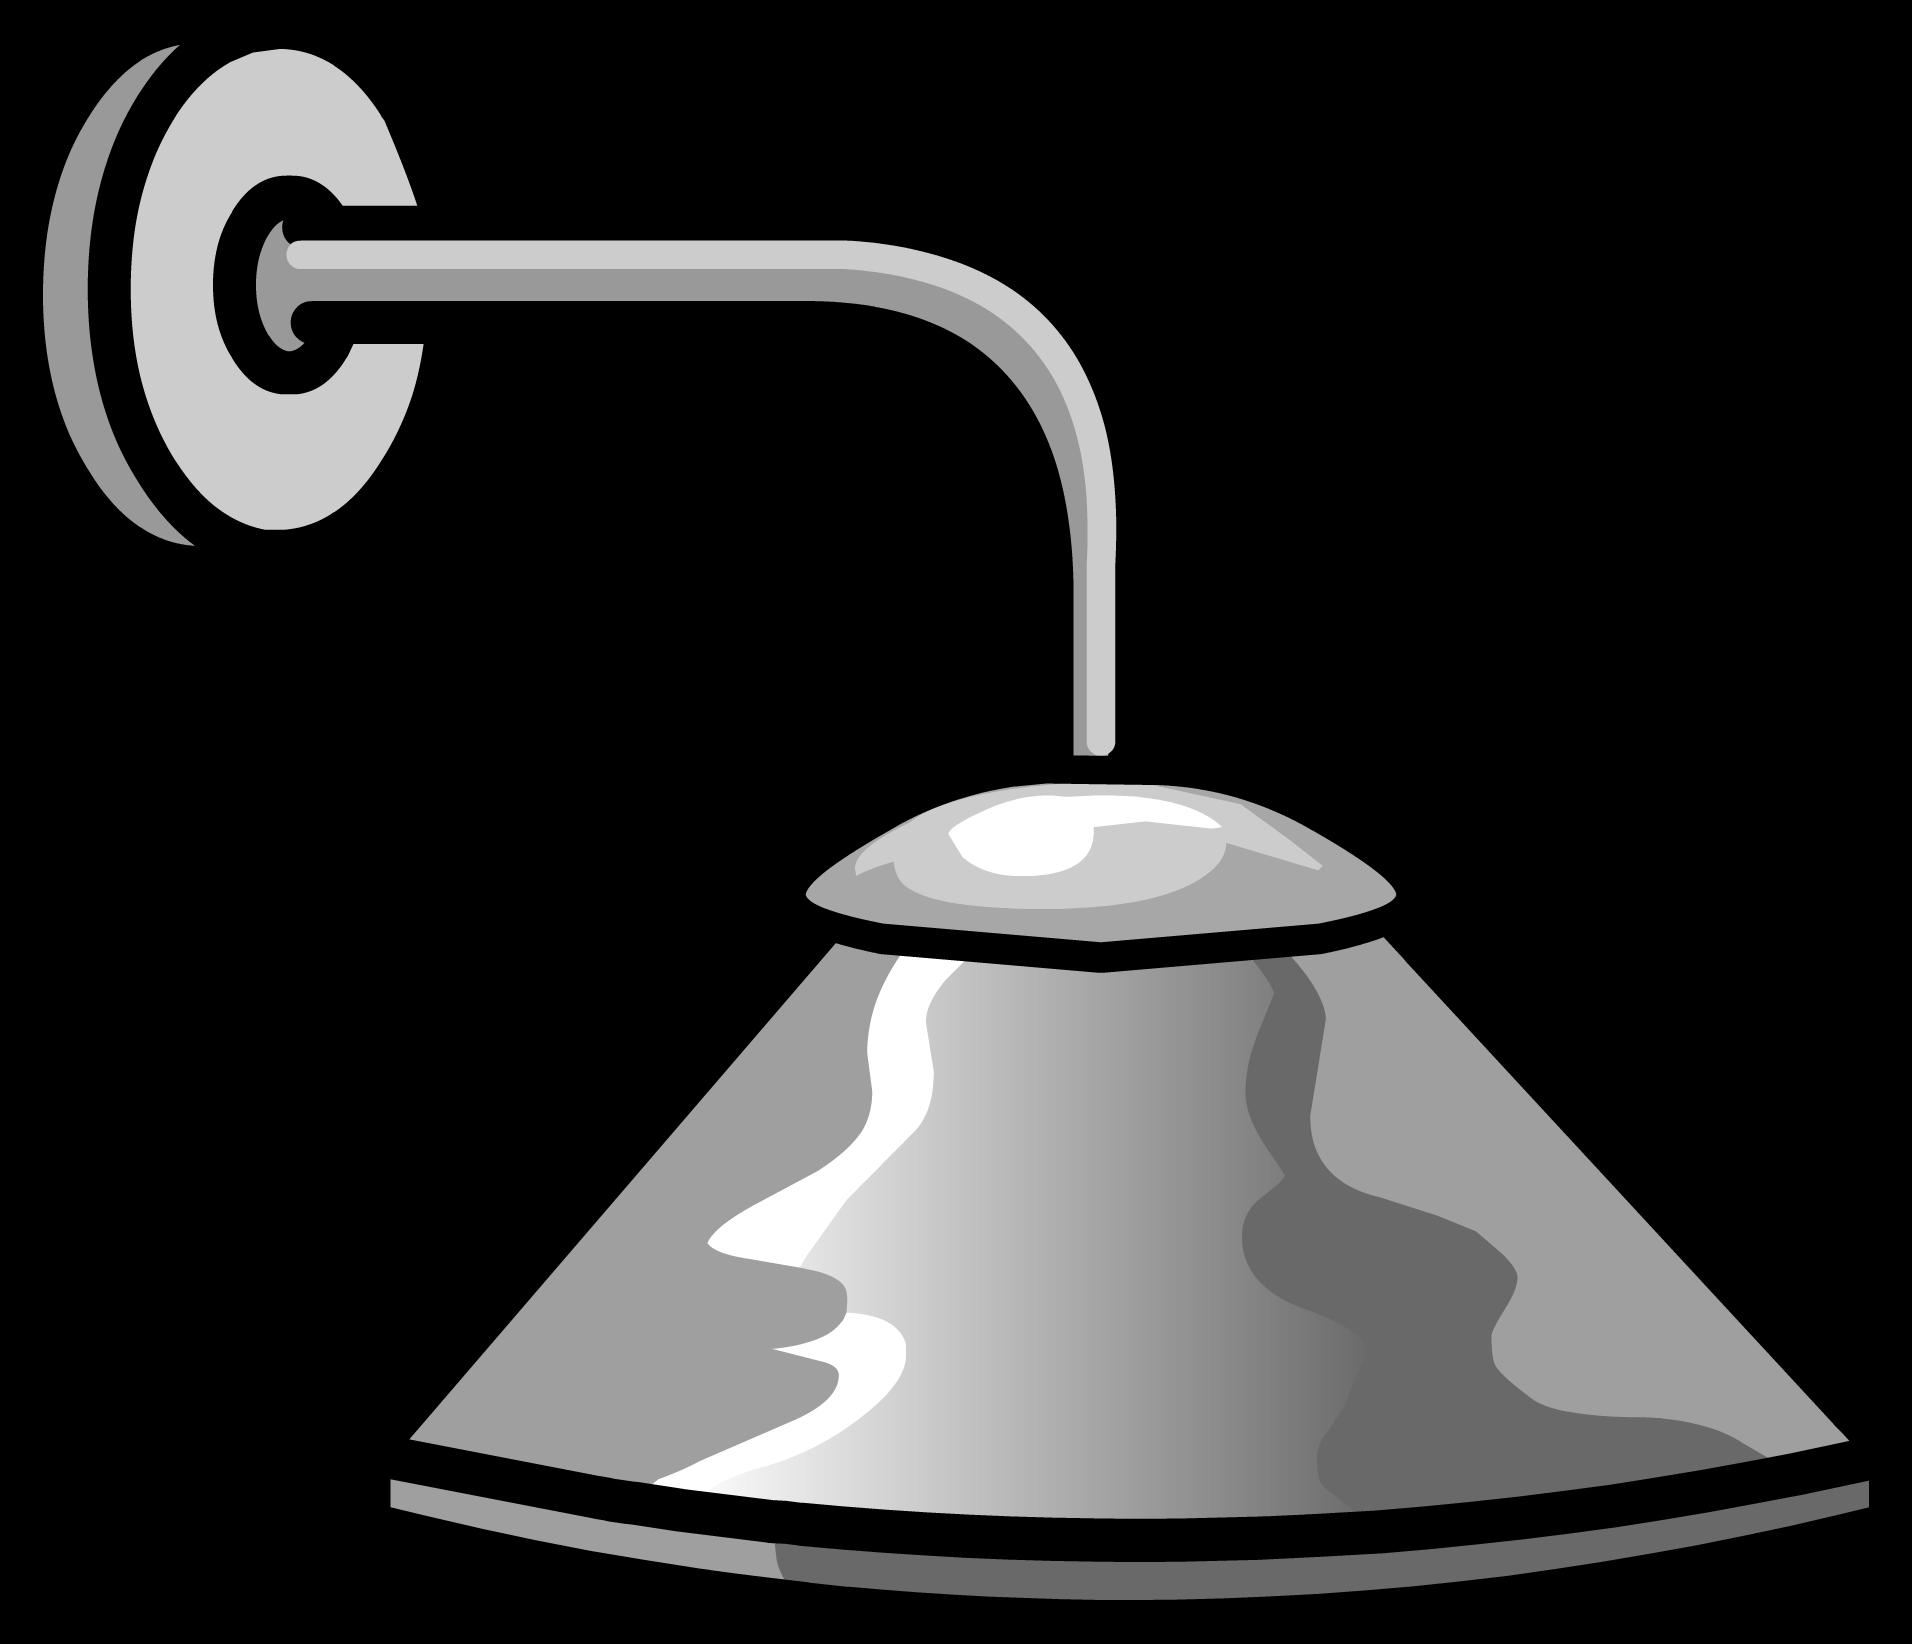 Lamp clipart wall lamp. Overhead light club penguin